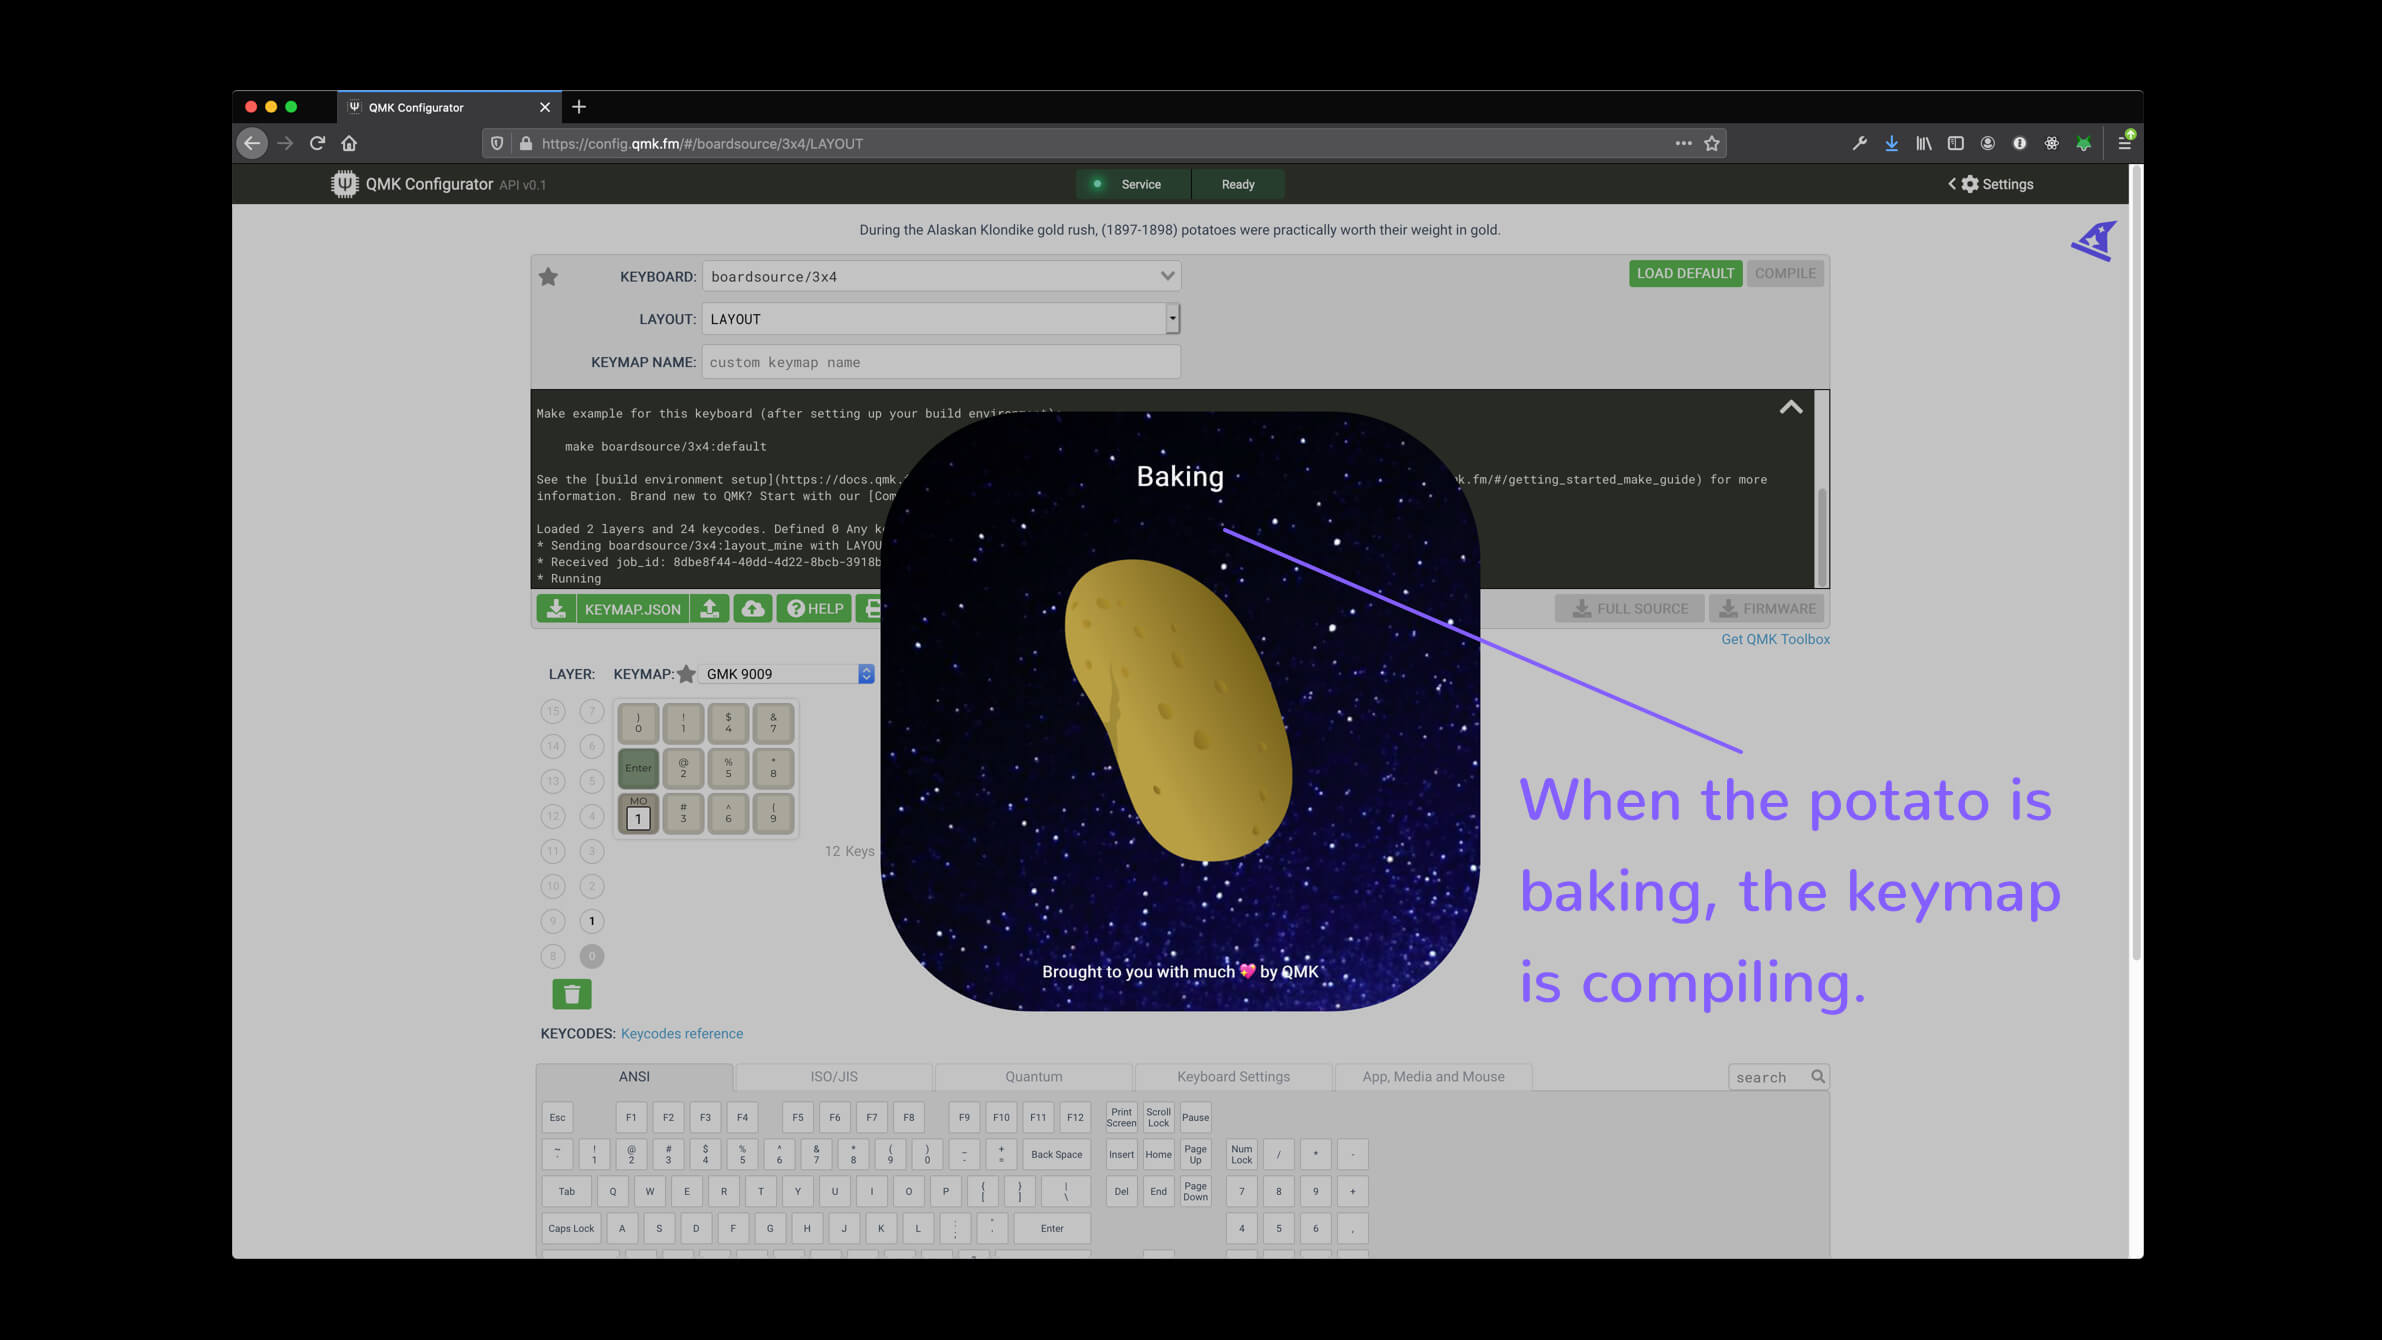 qmk configurator compiling potato